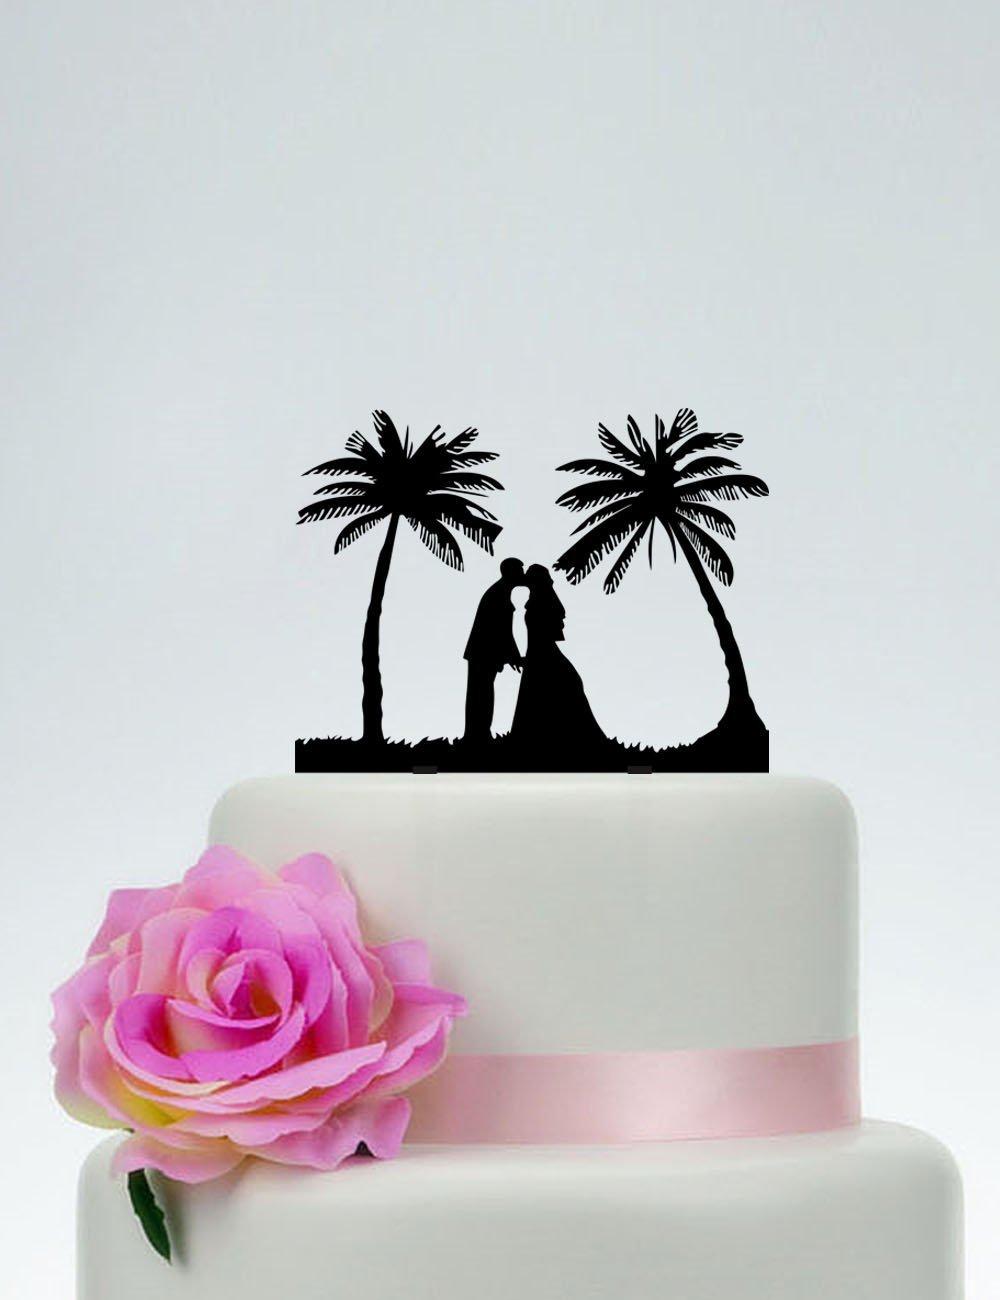 Cheap Beach Cake Theme Find Beach Cake Theme Deals On Line At